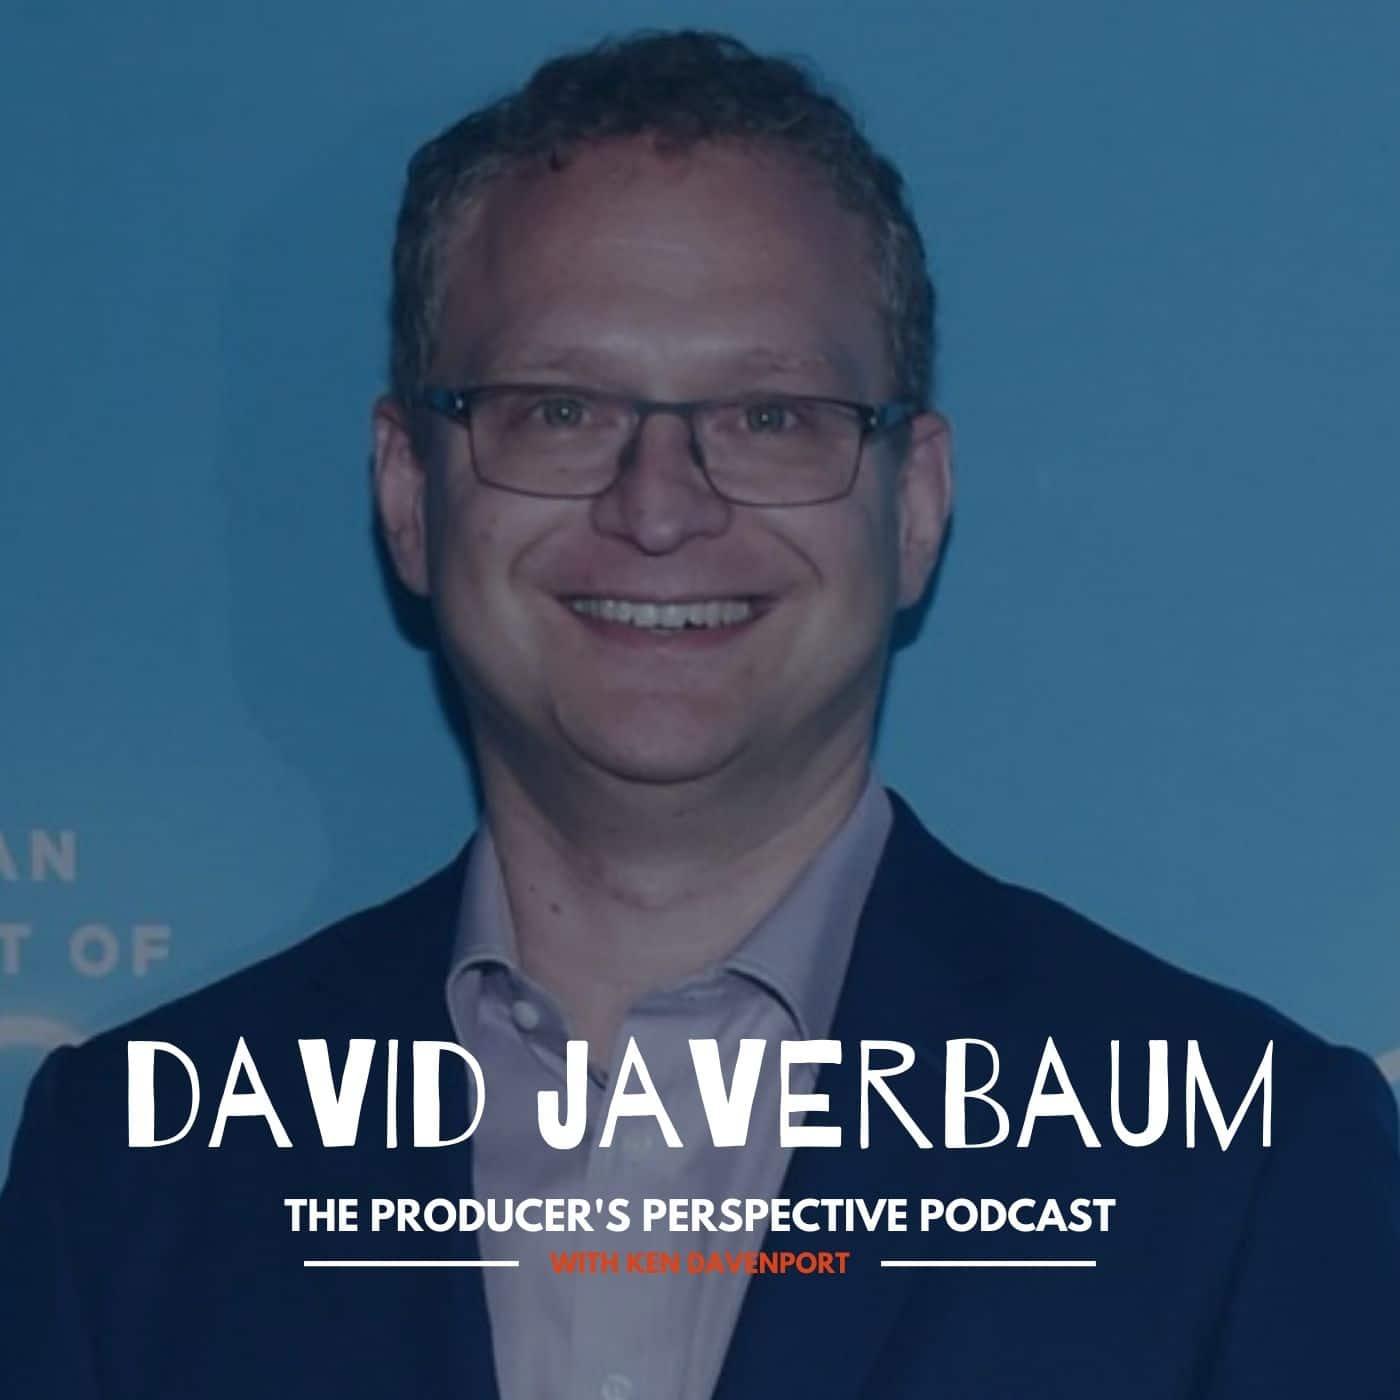 Ken Davenport's The Producer's Perspective Podcast Episode 125 - David Javerbaum